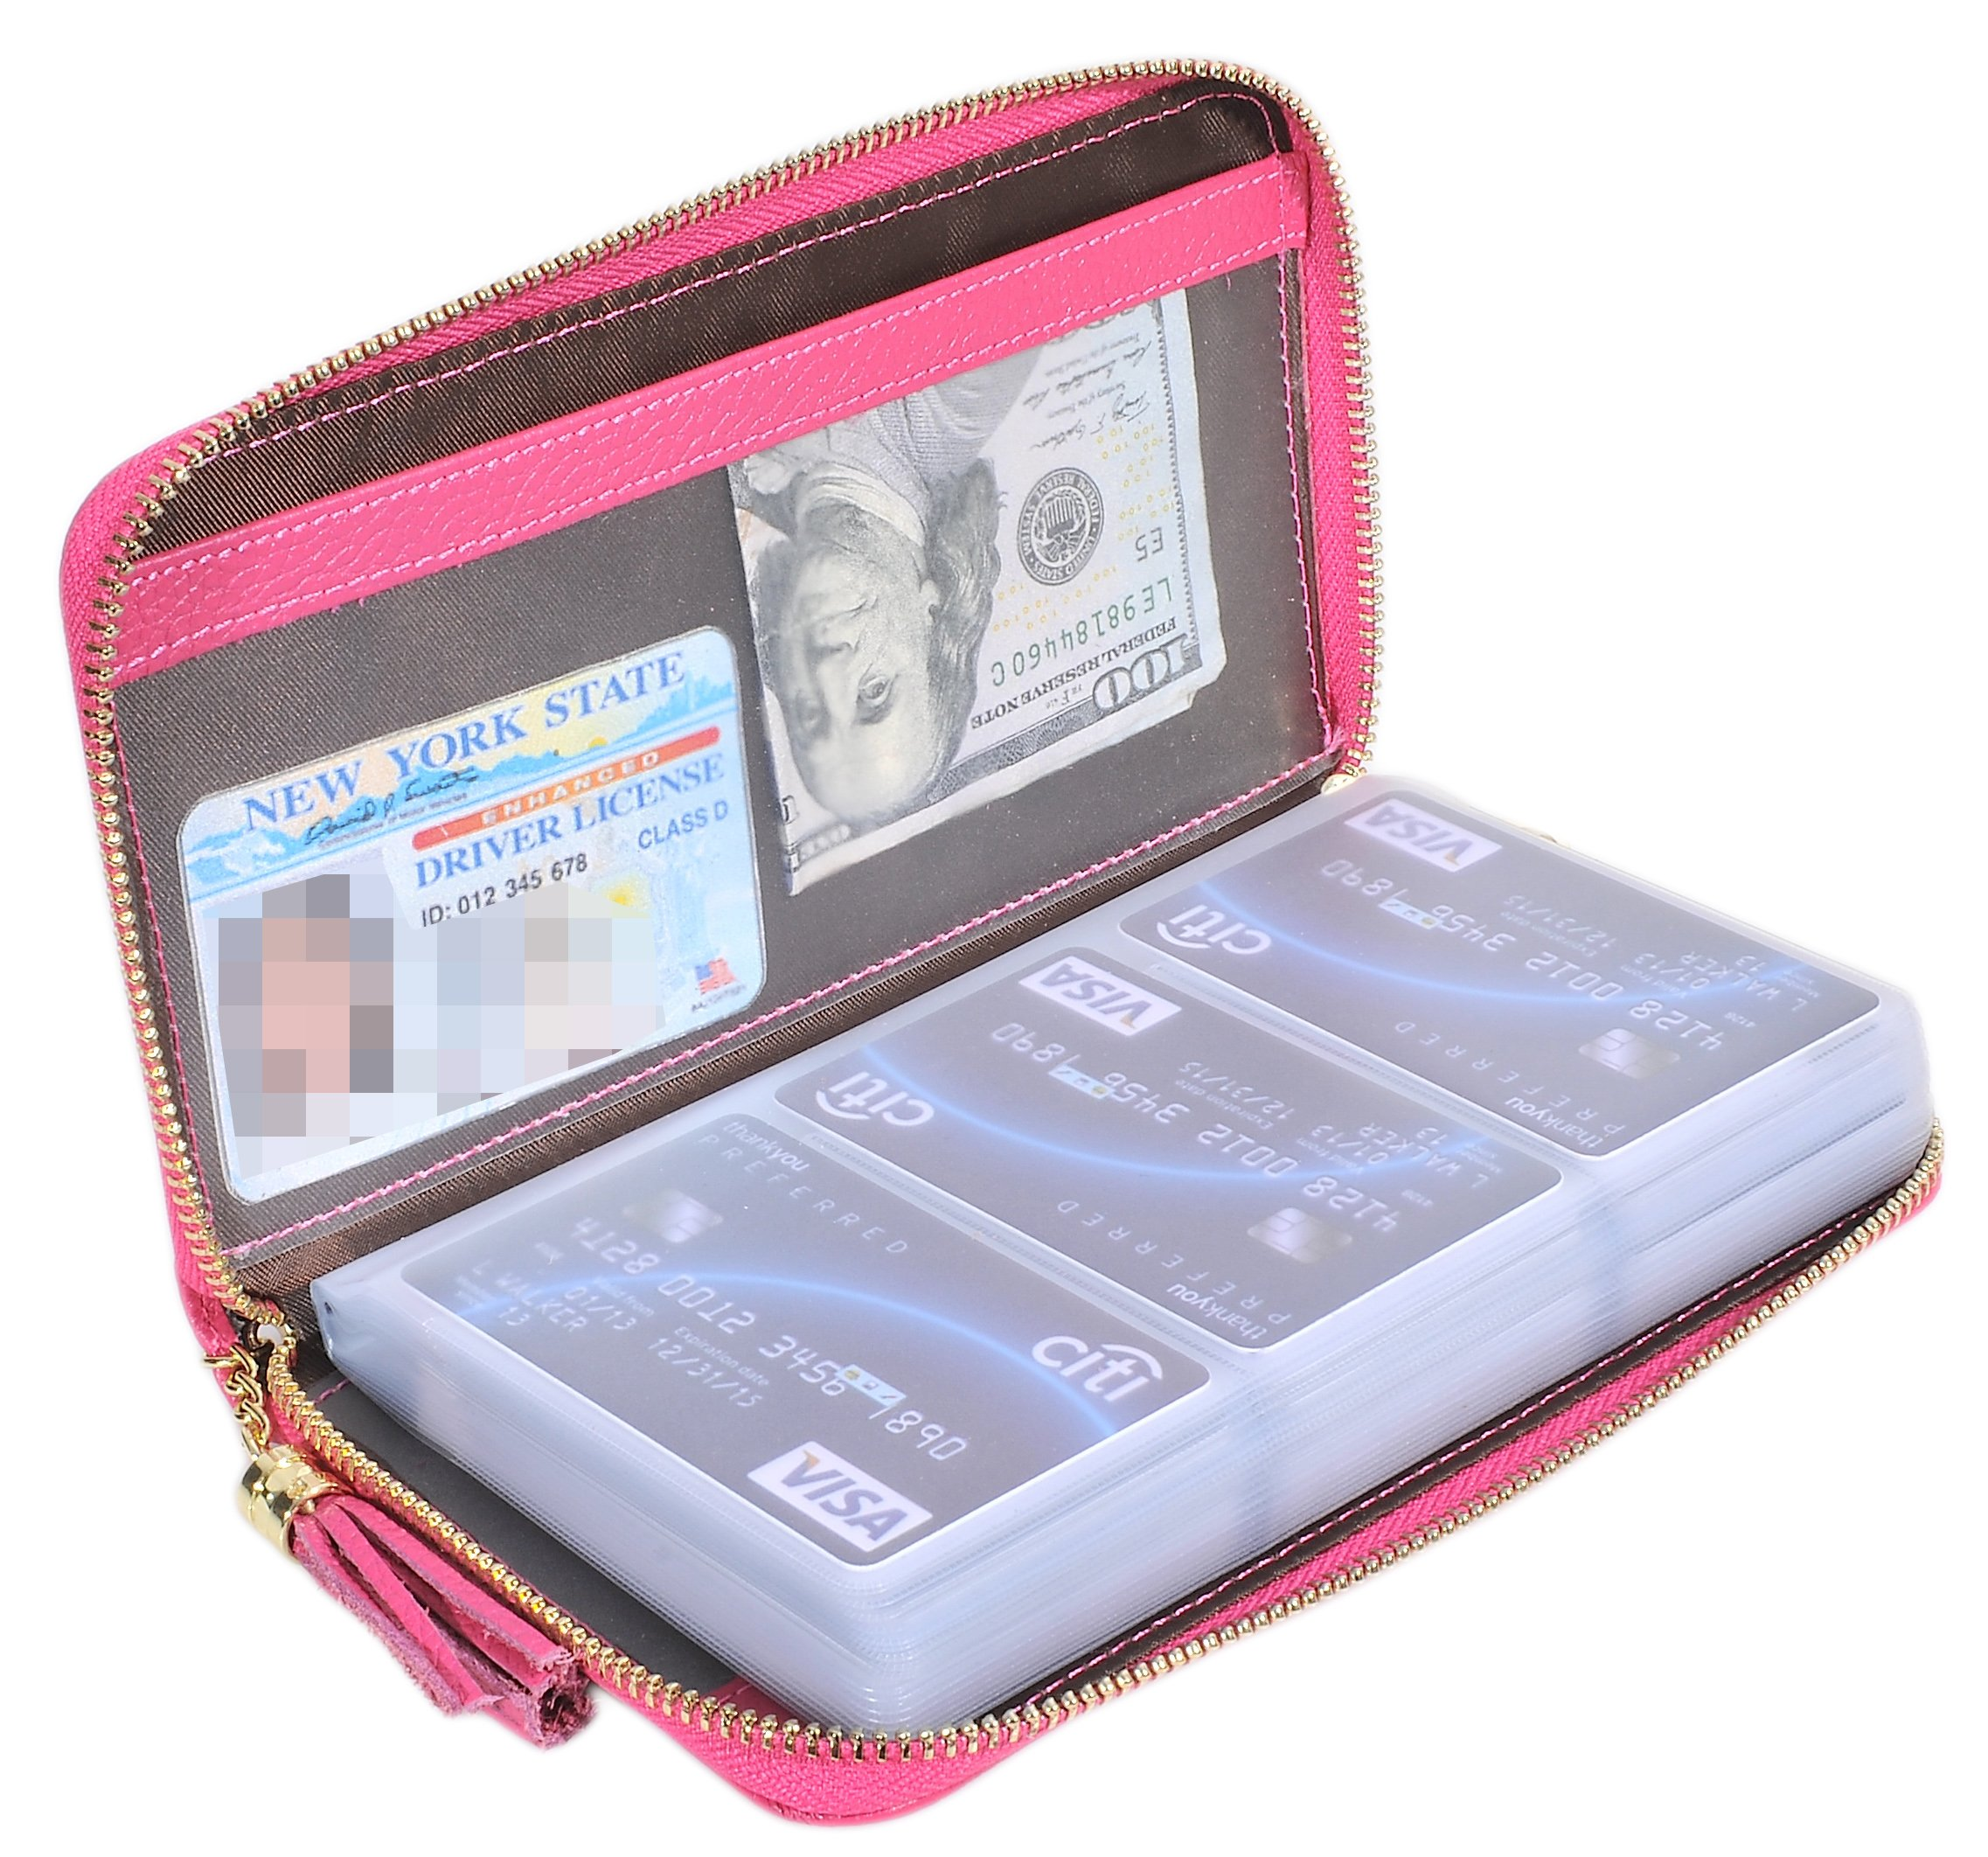 Easyoulife Credit Card Holder Wallet Womens Zipper Leather Case Purse RFID Blocking (Rose)